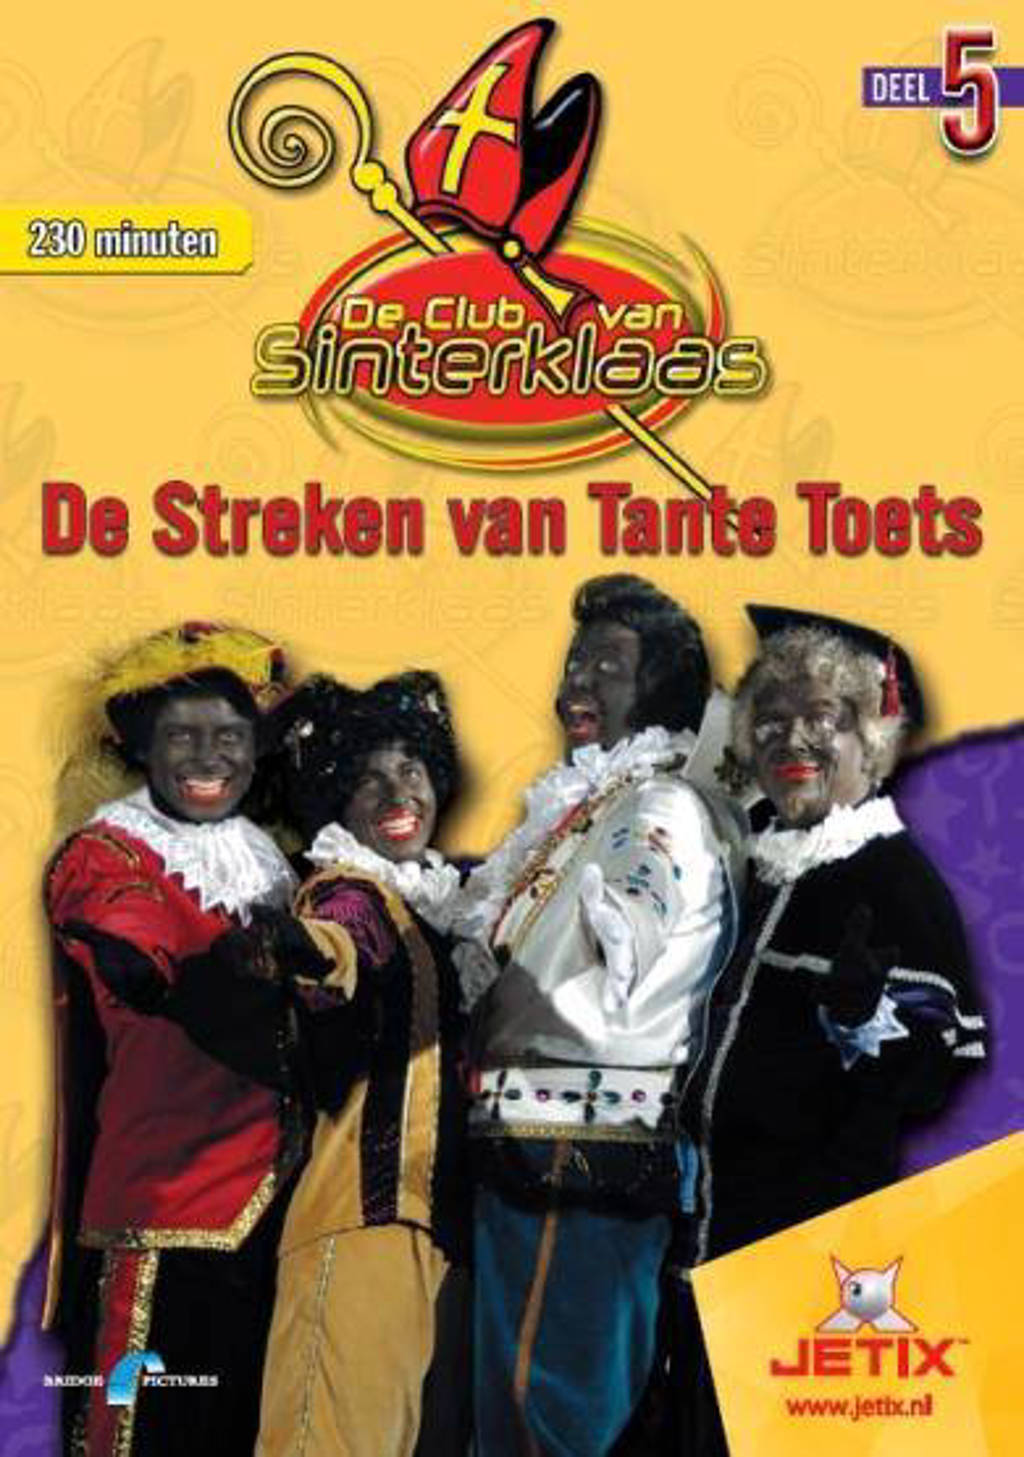 Club van Sinterklaas 5 - De streken van tante Toets (DVD)